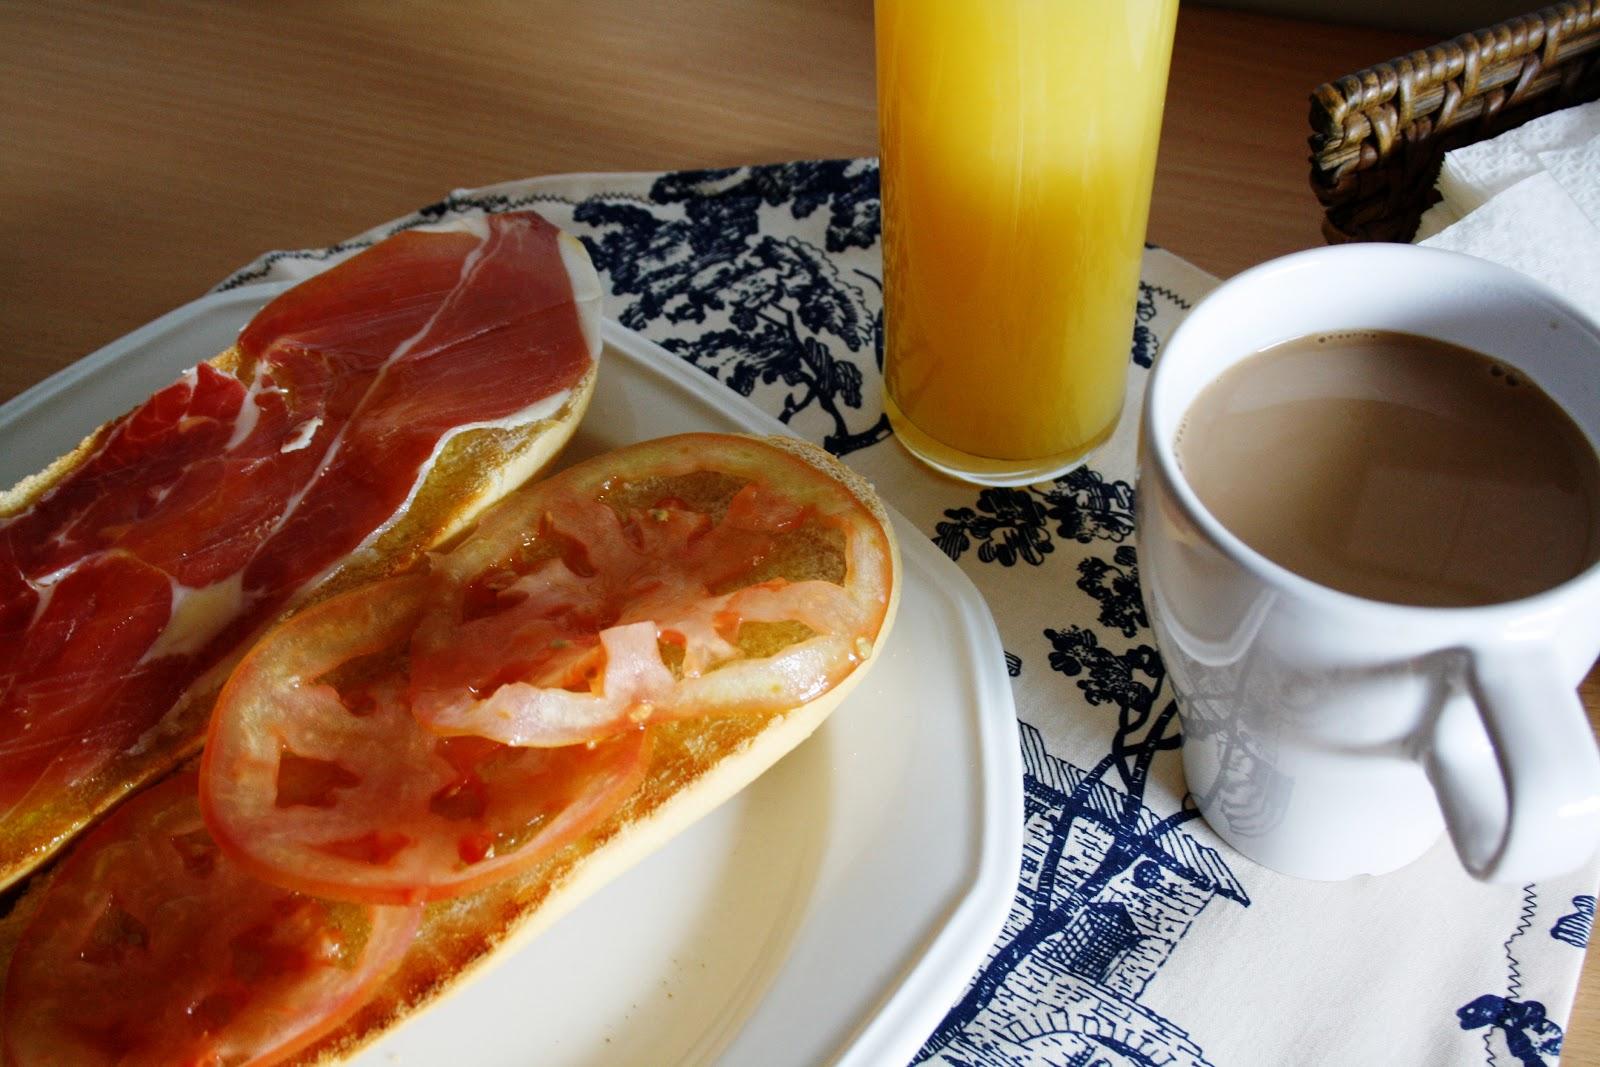 La Cocina de Maricarmen: Desayuno español - Spanish breakfast Desayuno Espanol Tipico